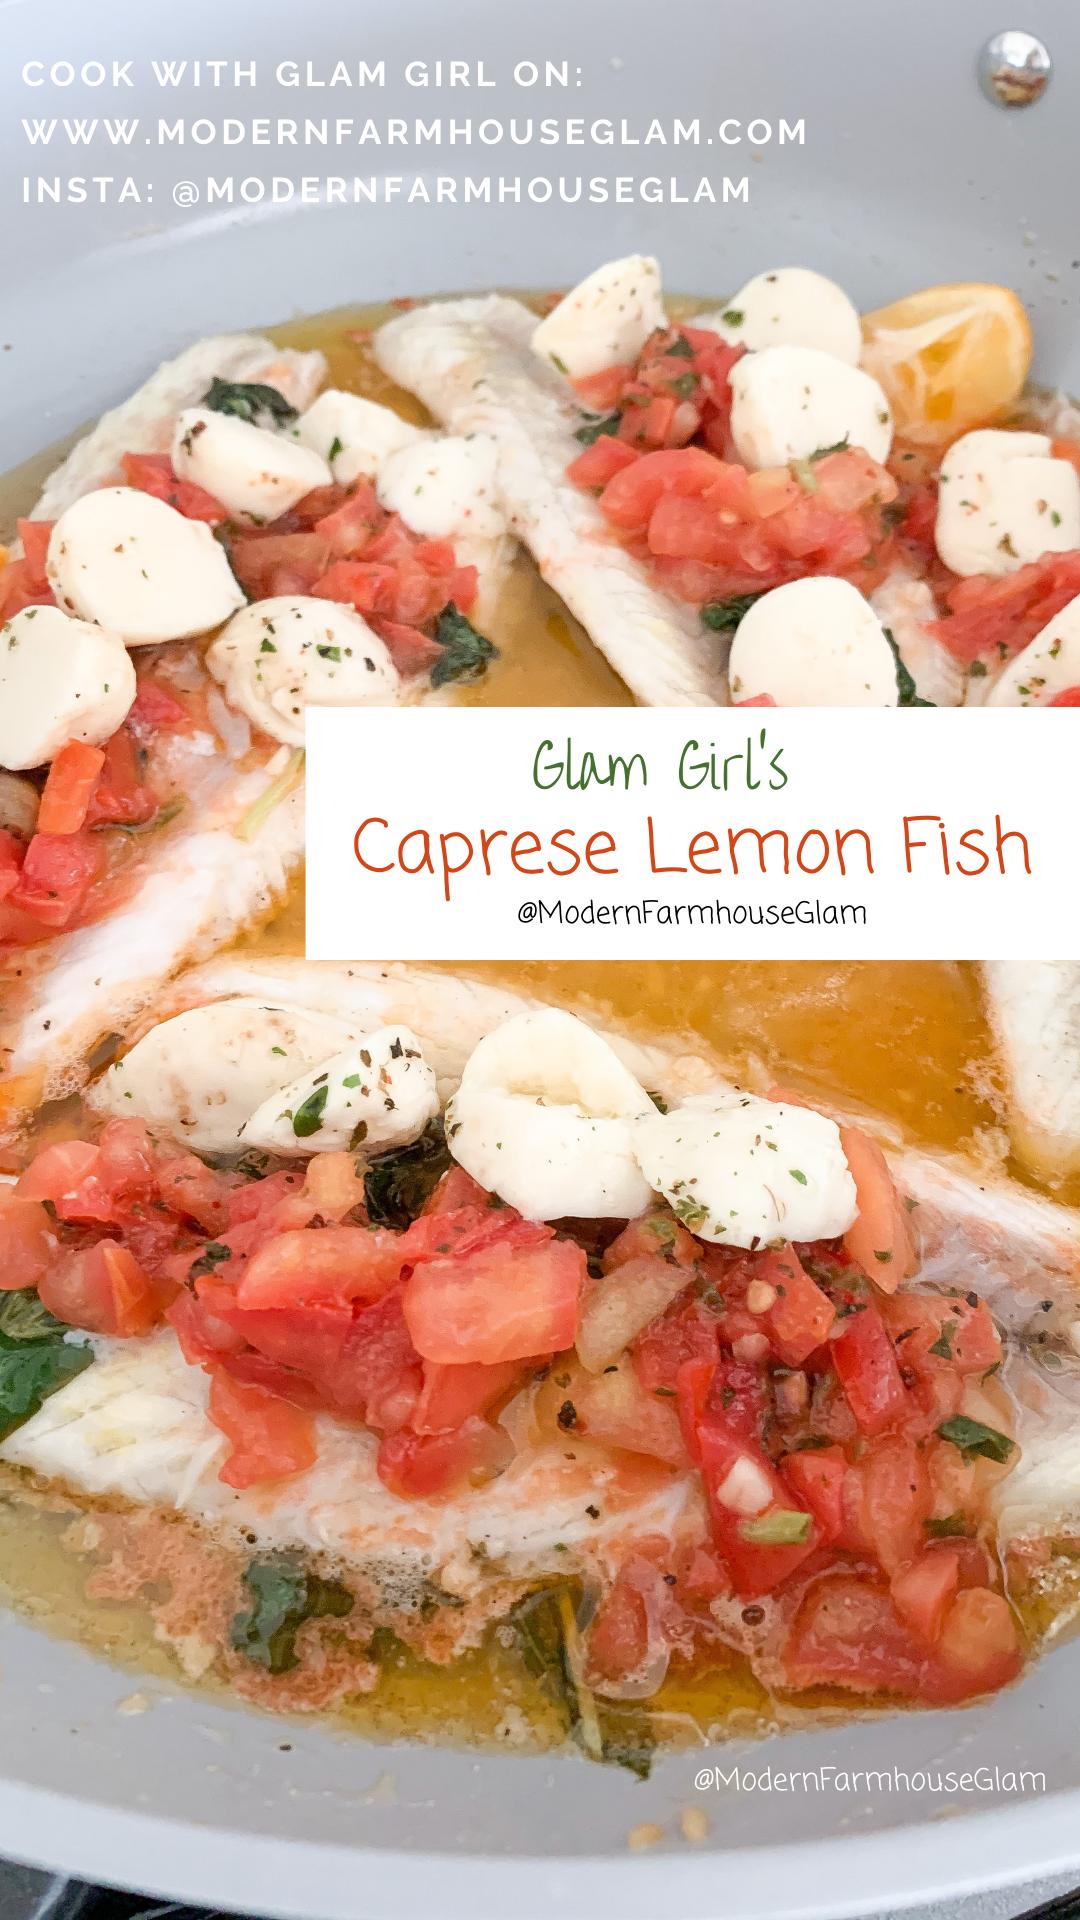 Caprese Lemon Fish REcipe and cooking Video, Dinner Ideas, Healthy Dinner Recipe